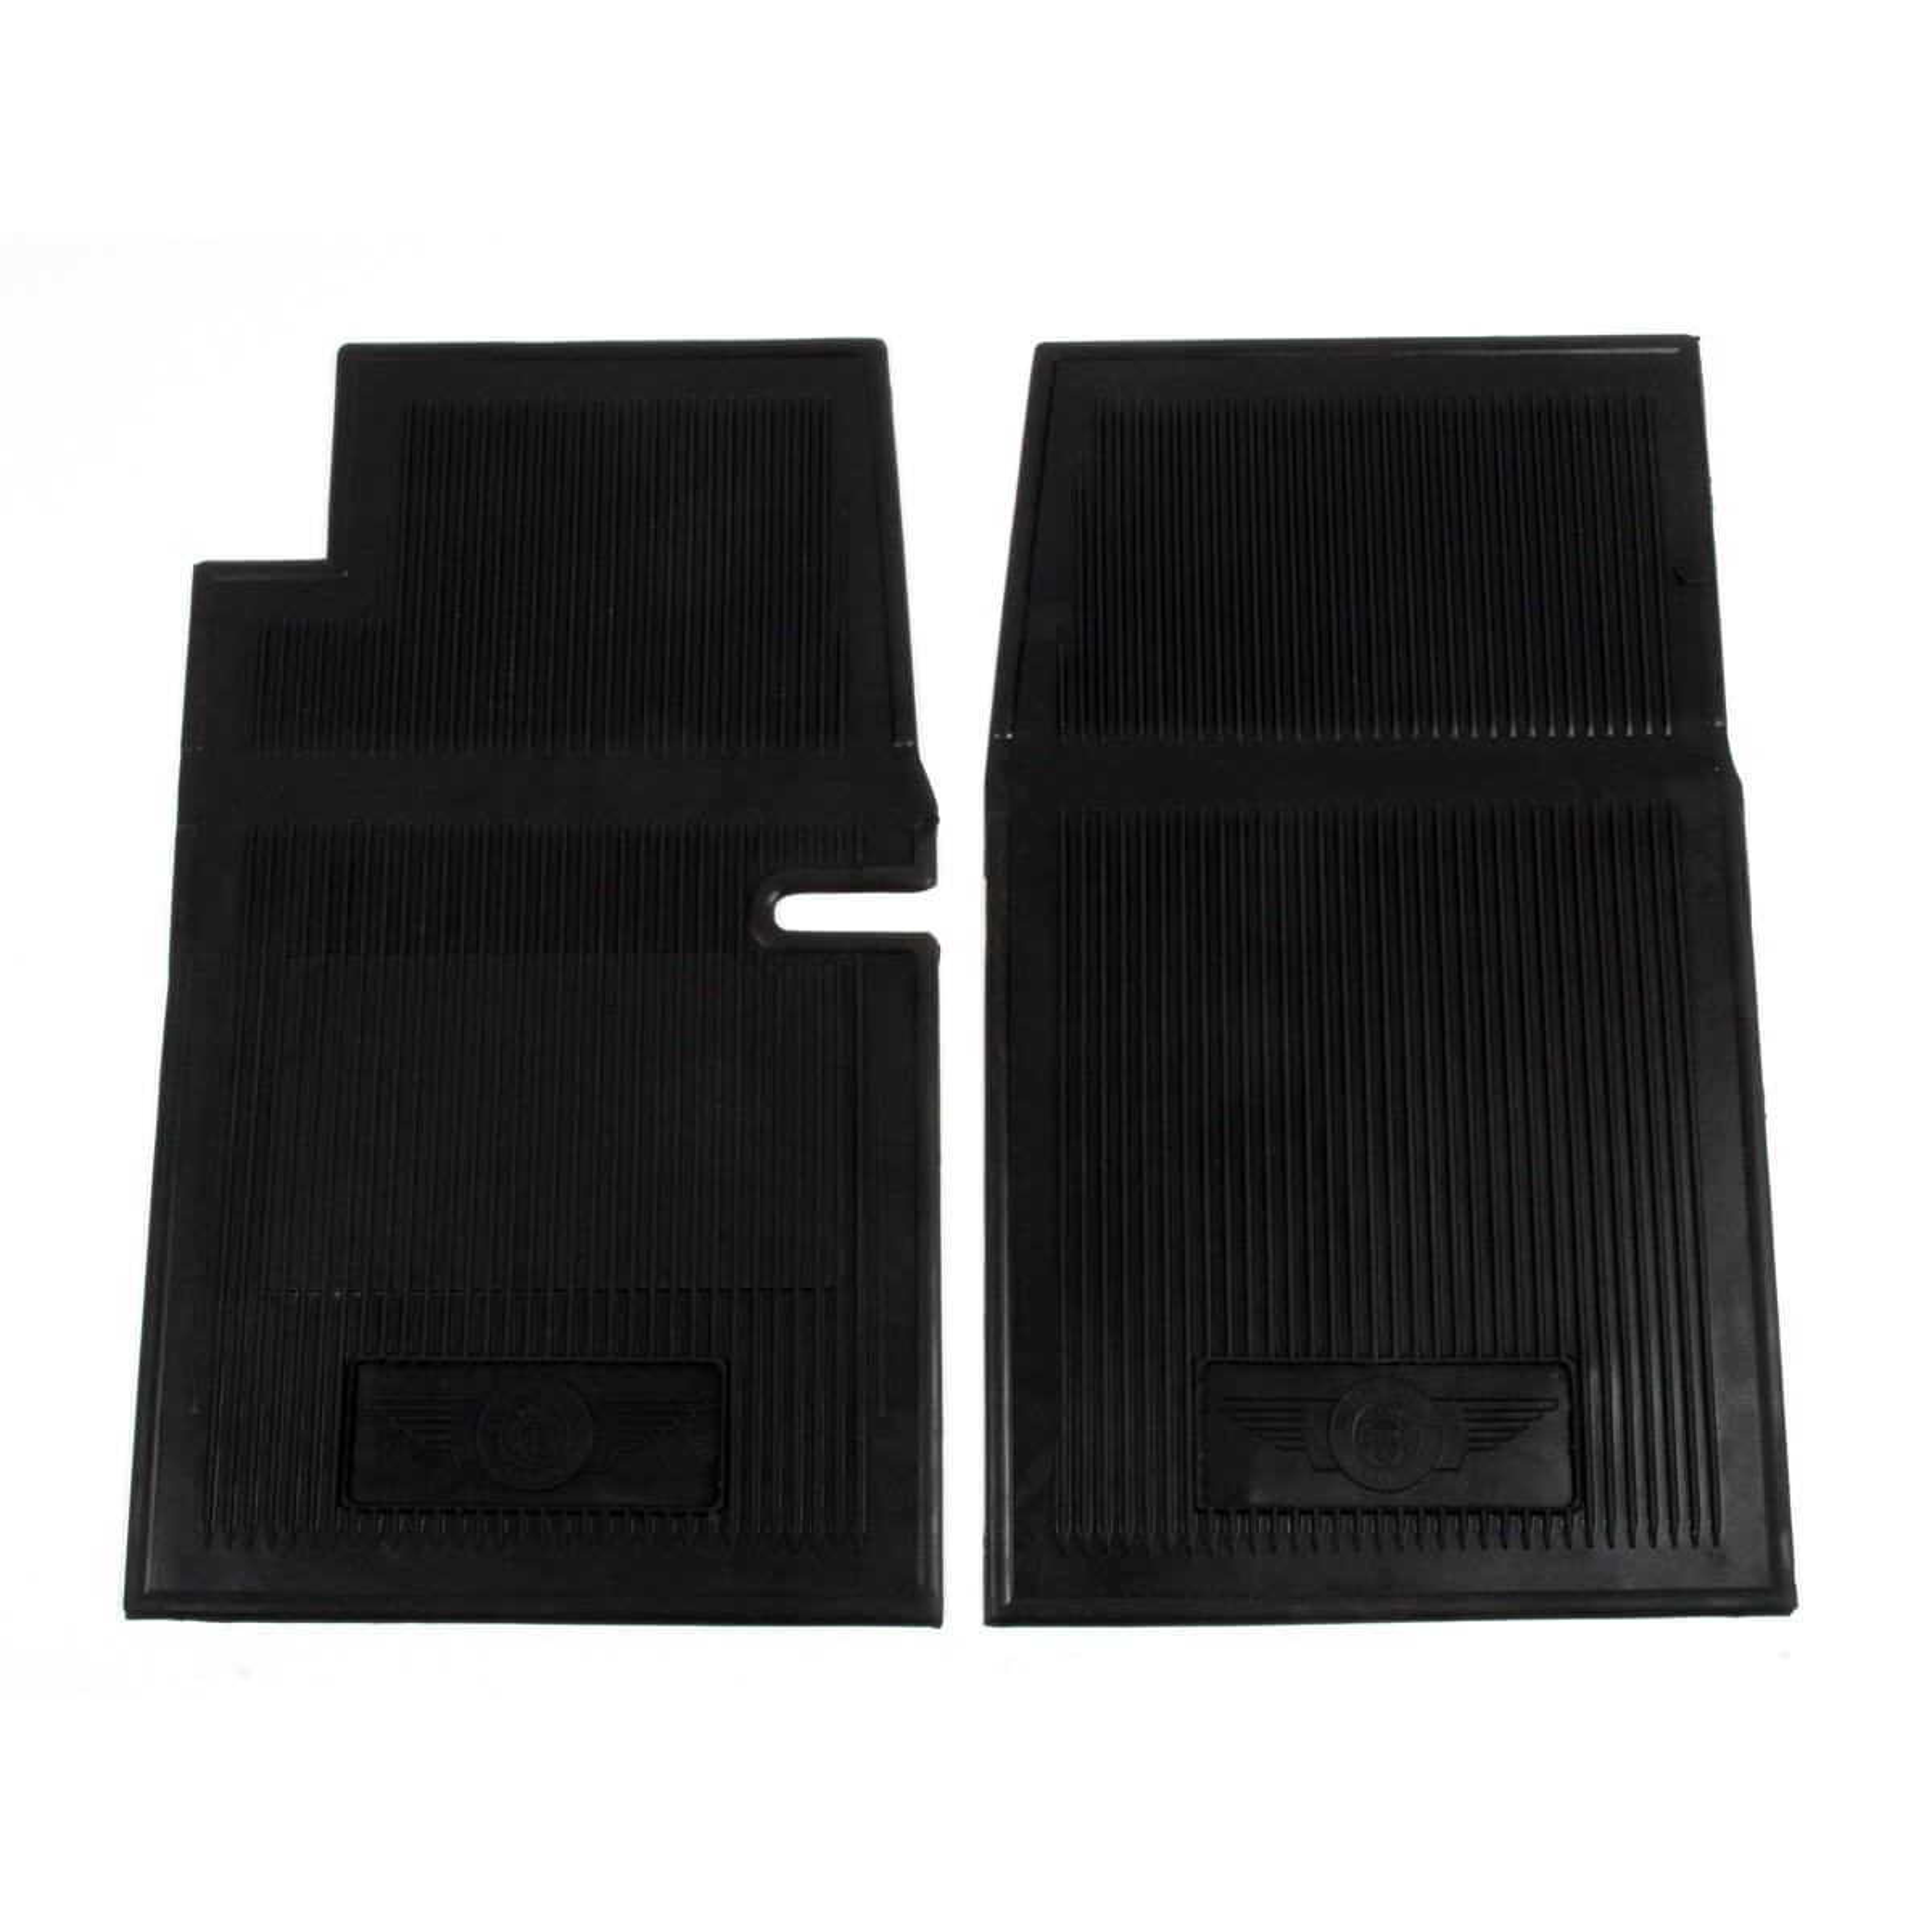 Rubber Floor Mat Set, Black - Carpet Kits & Floor Mats ...